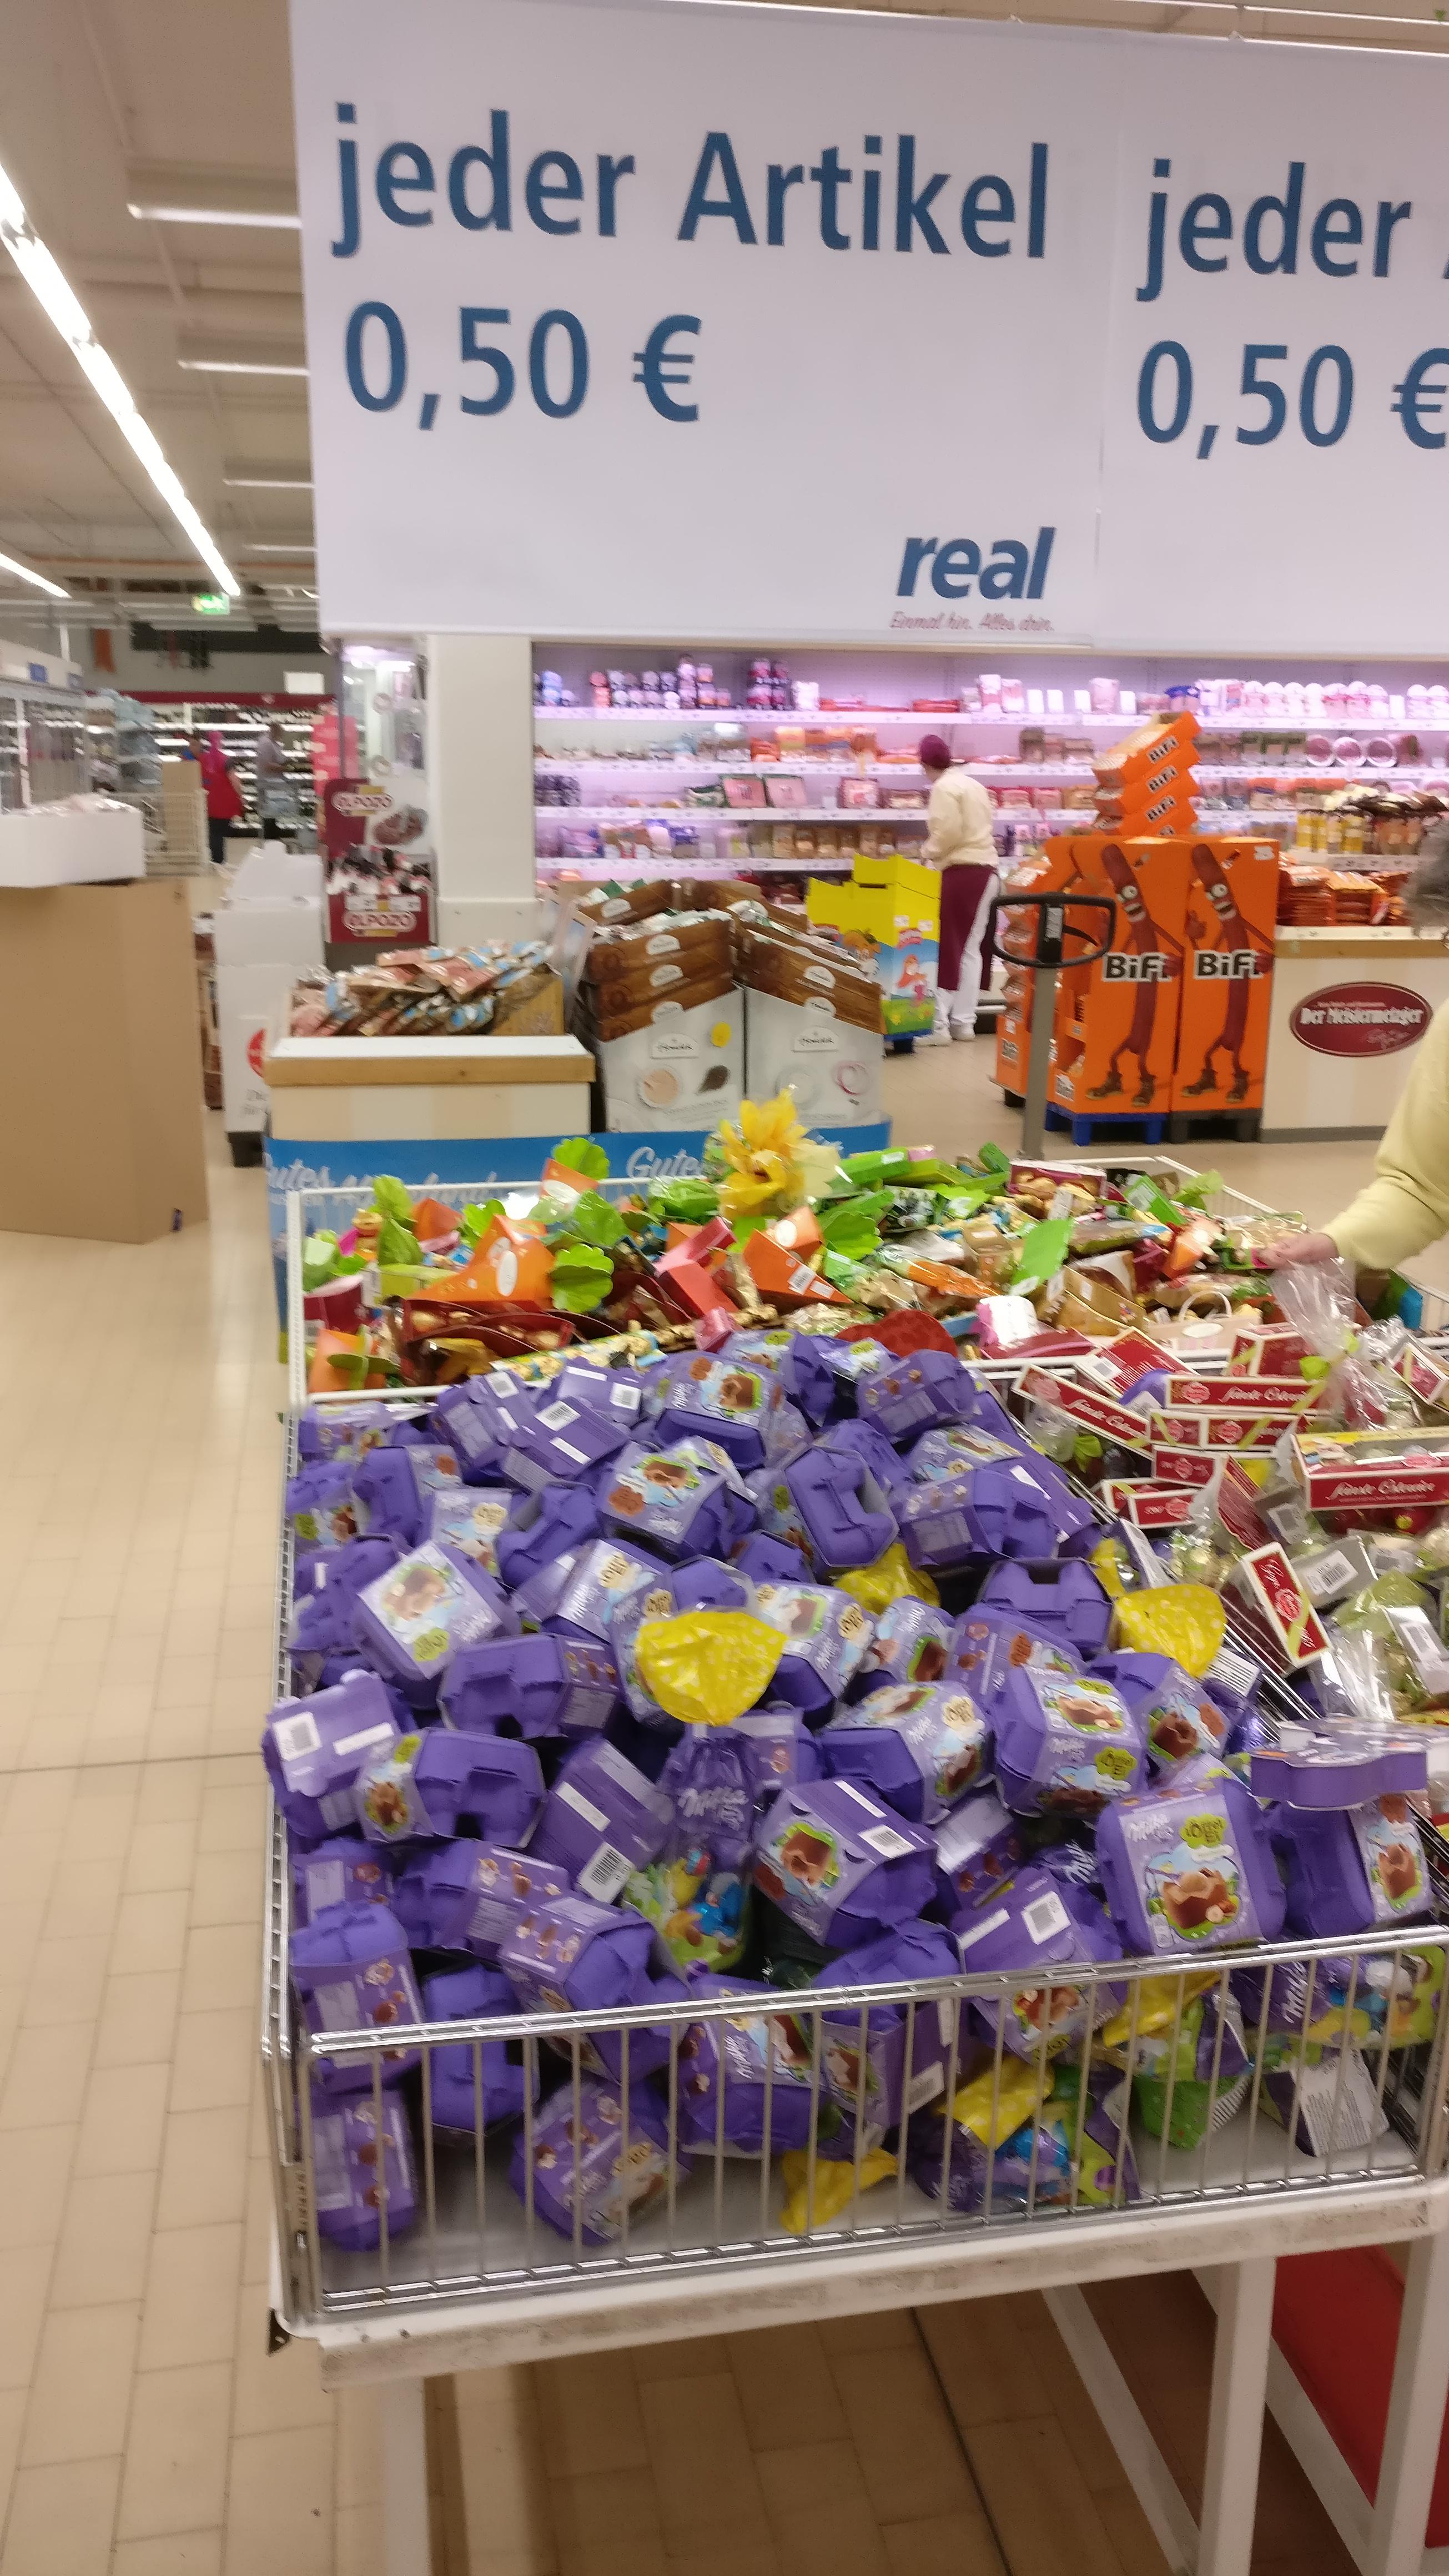 [Lokal Amberg] Real: Osterschokolade für 0,50€ (u.a. Milka, Lindt, Lidt Hello)